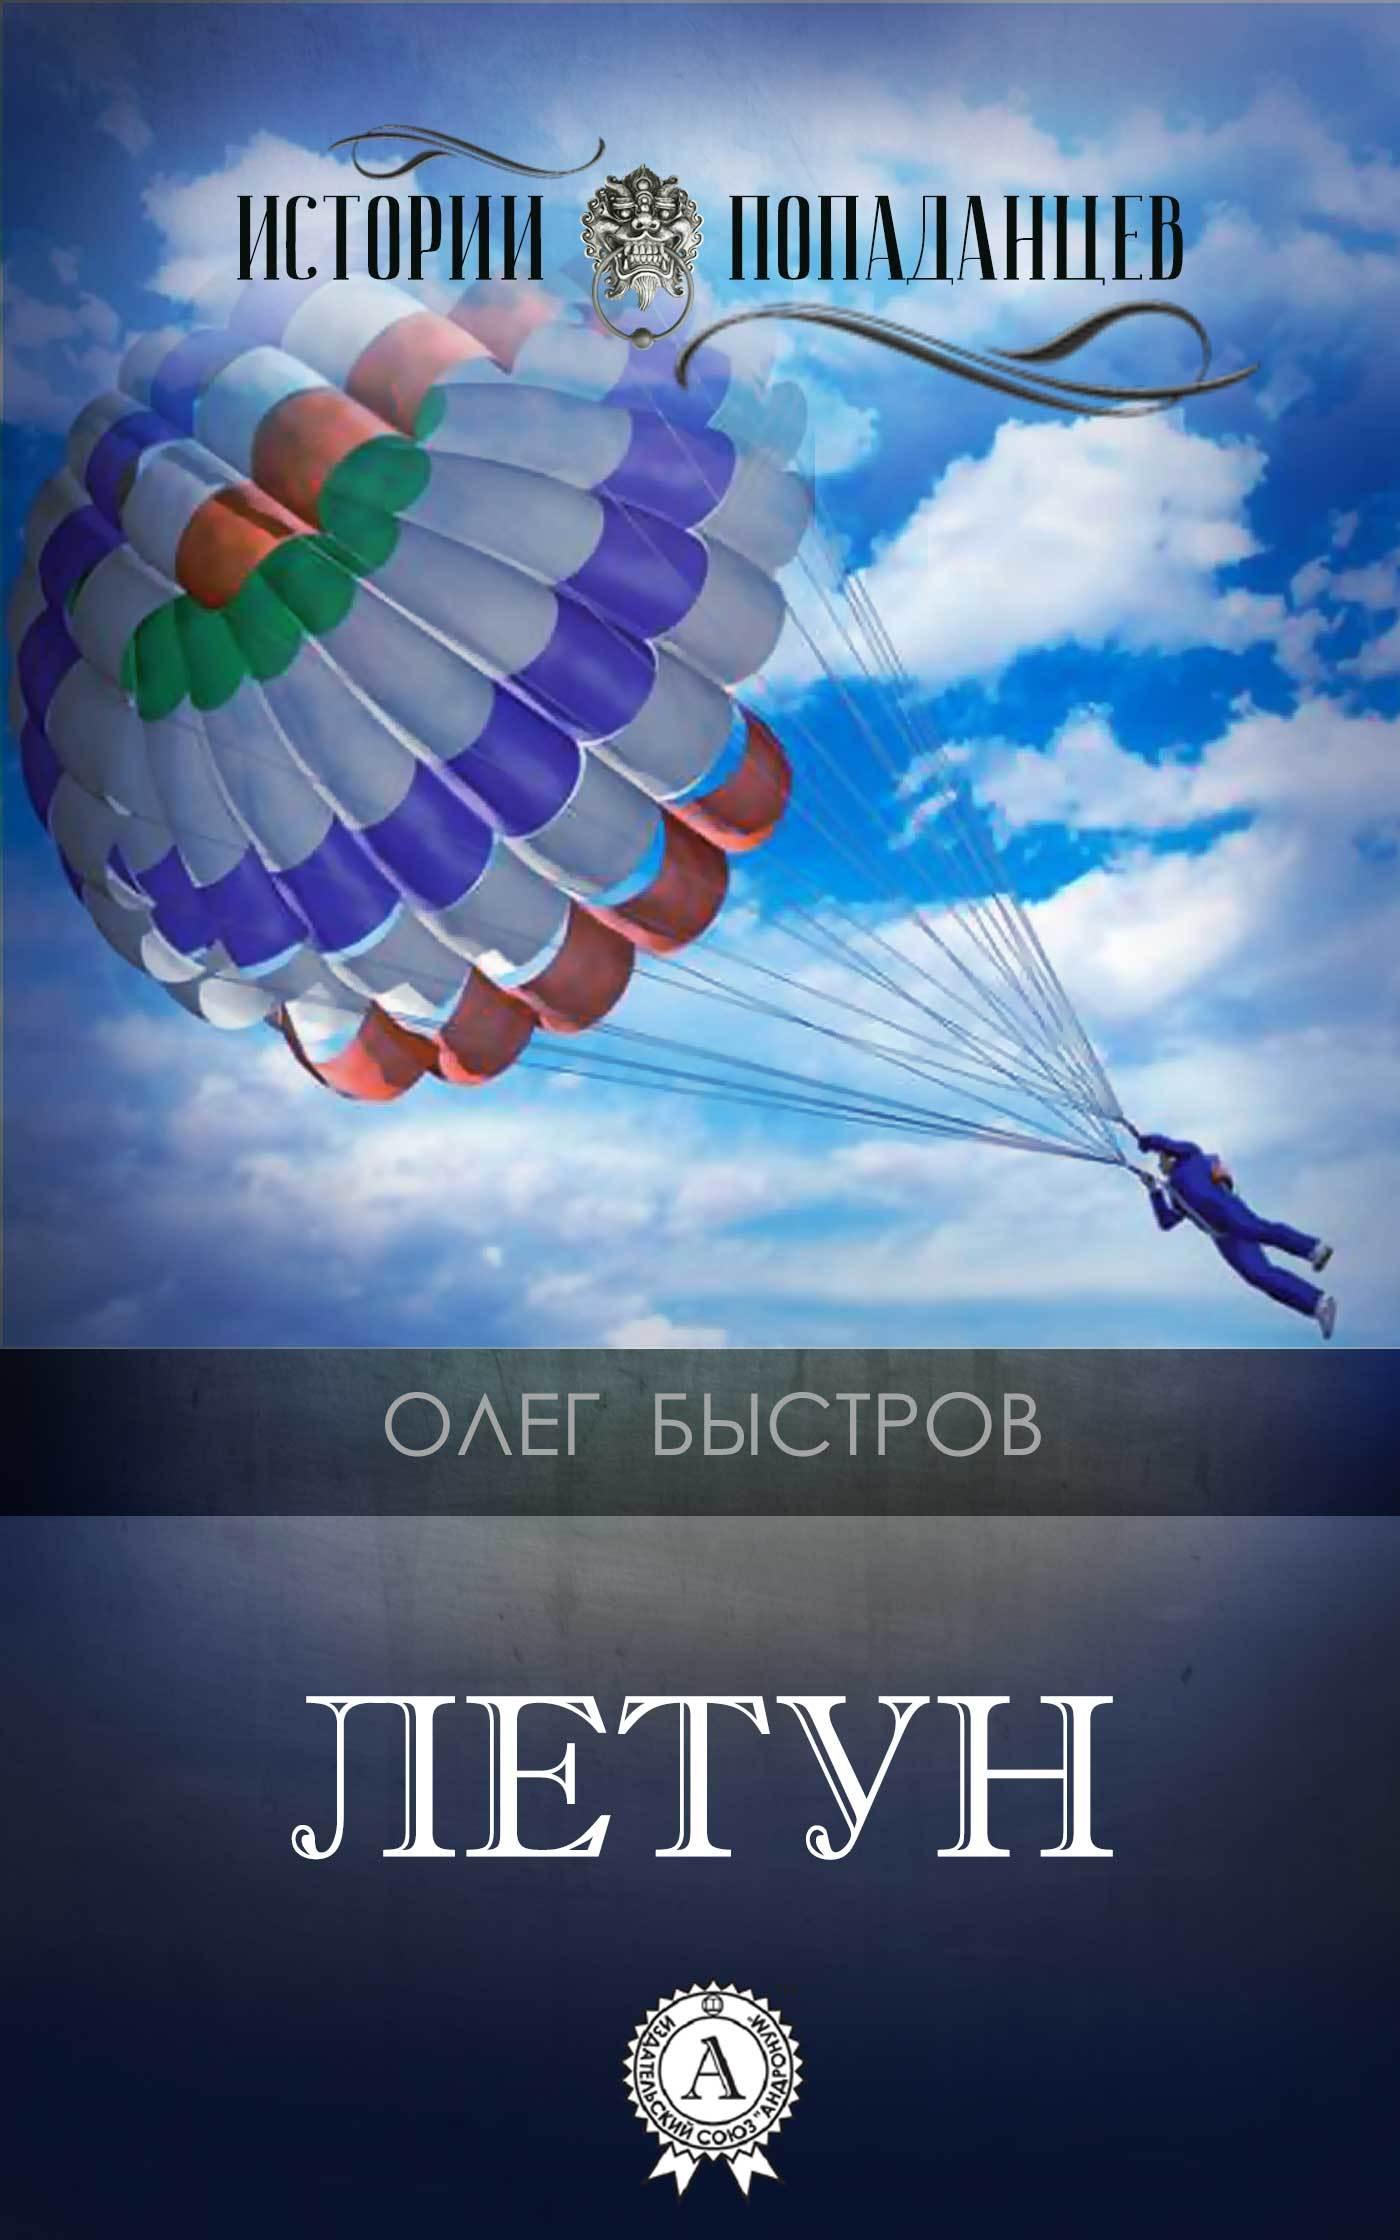 Олег Быстров - Летун